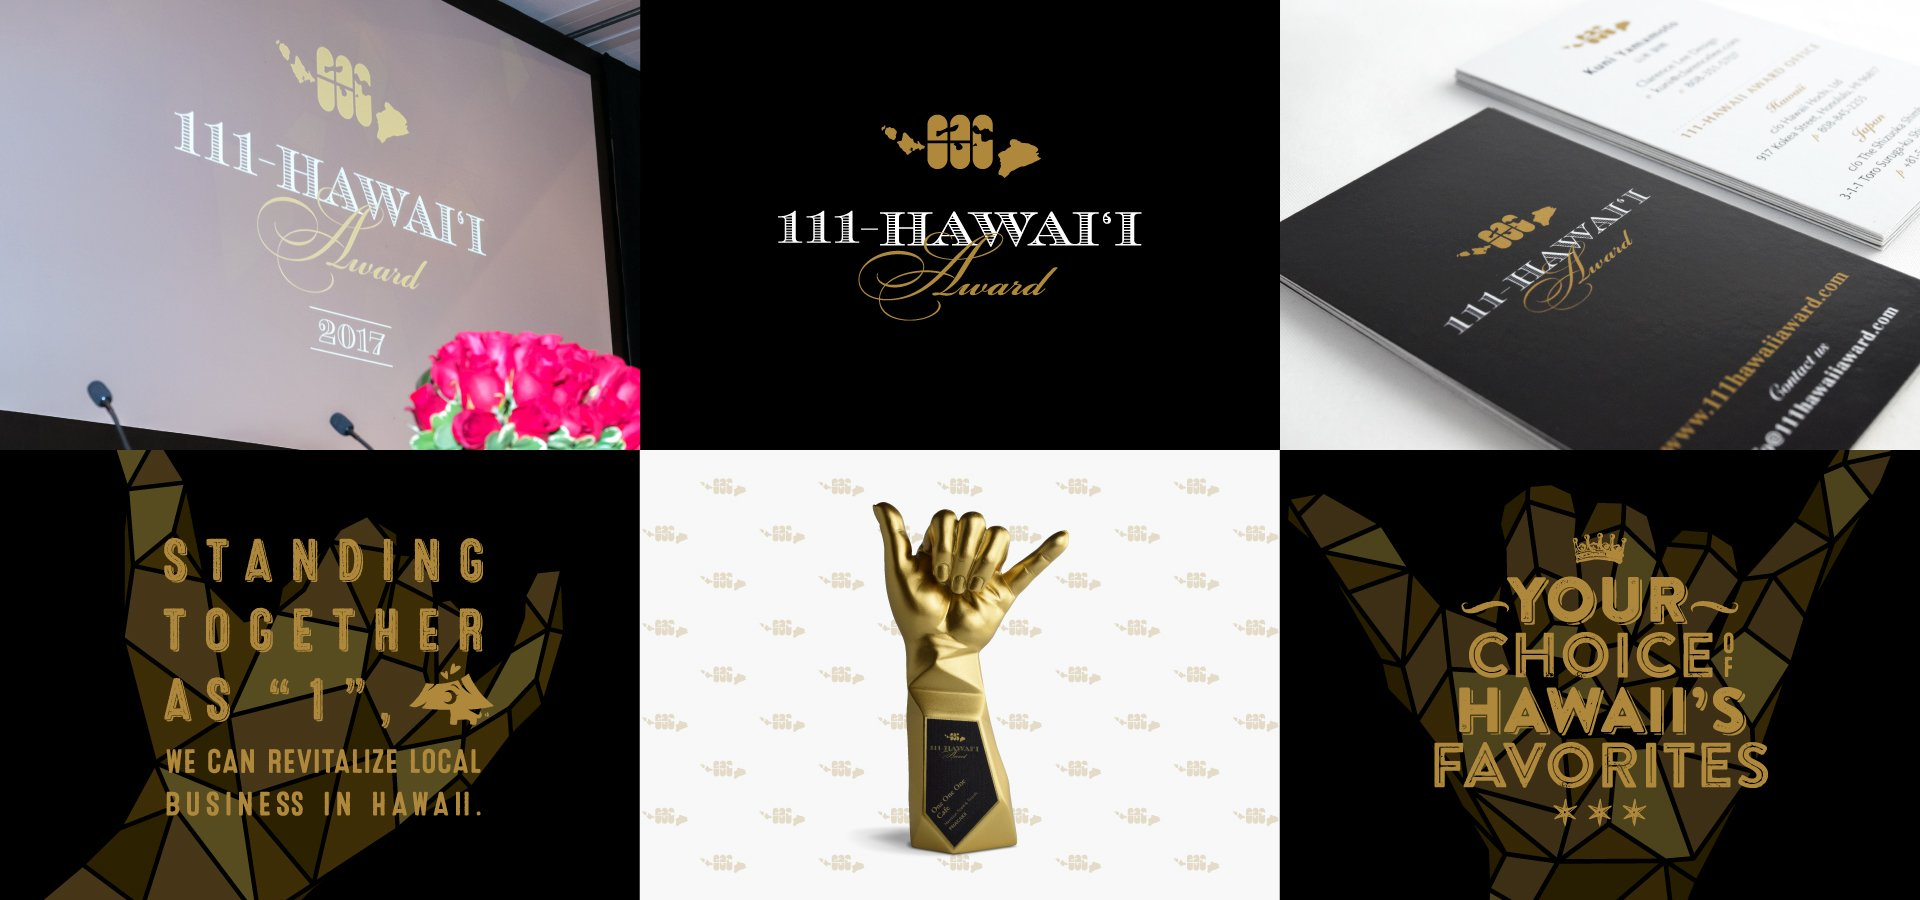 111-Hawaii Award Logo & Graphics